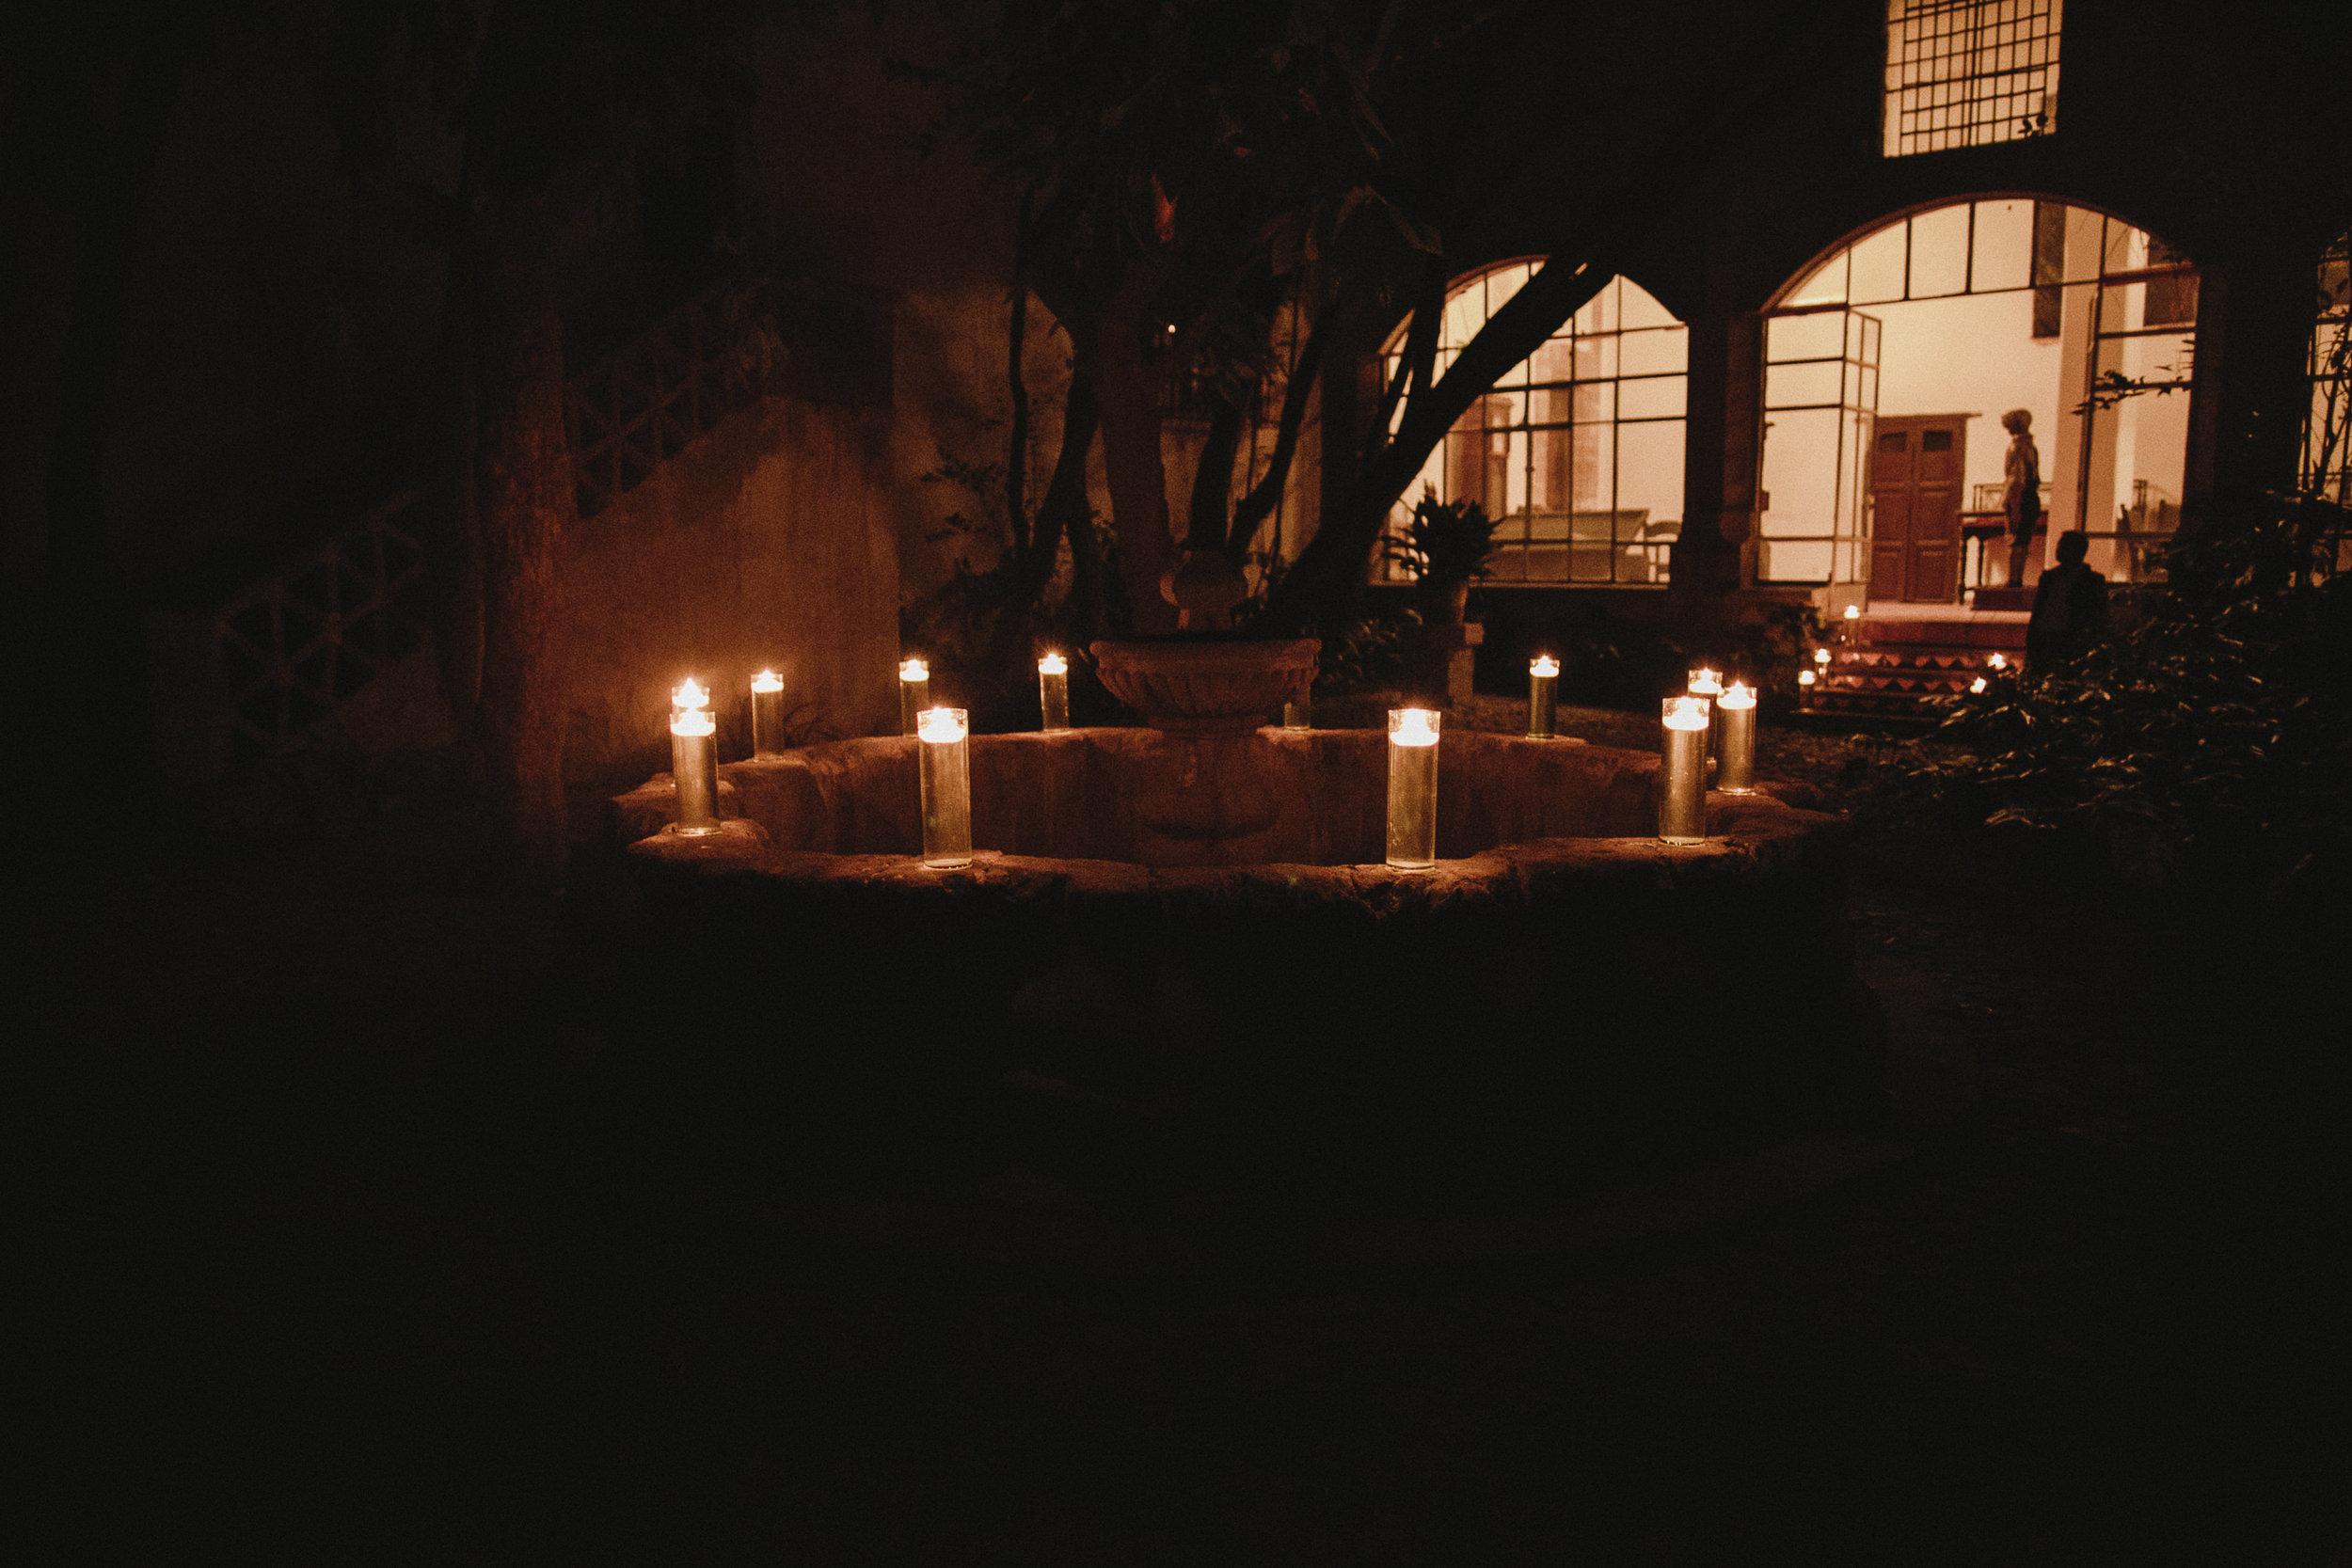 alfonso_flores_destination_wedding_photogrpahy_paola_alonso-681.JPG